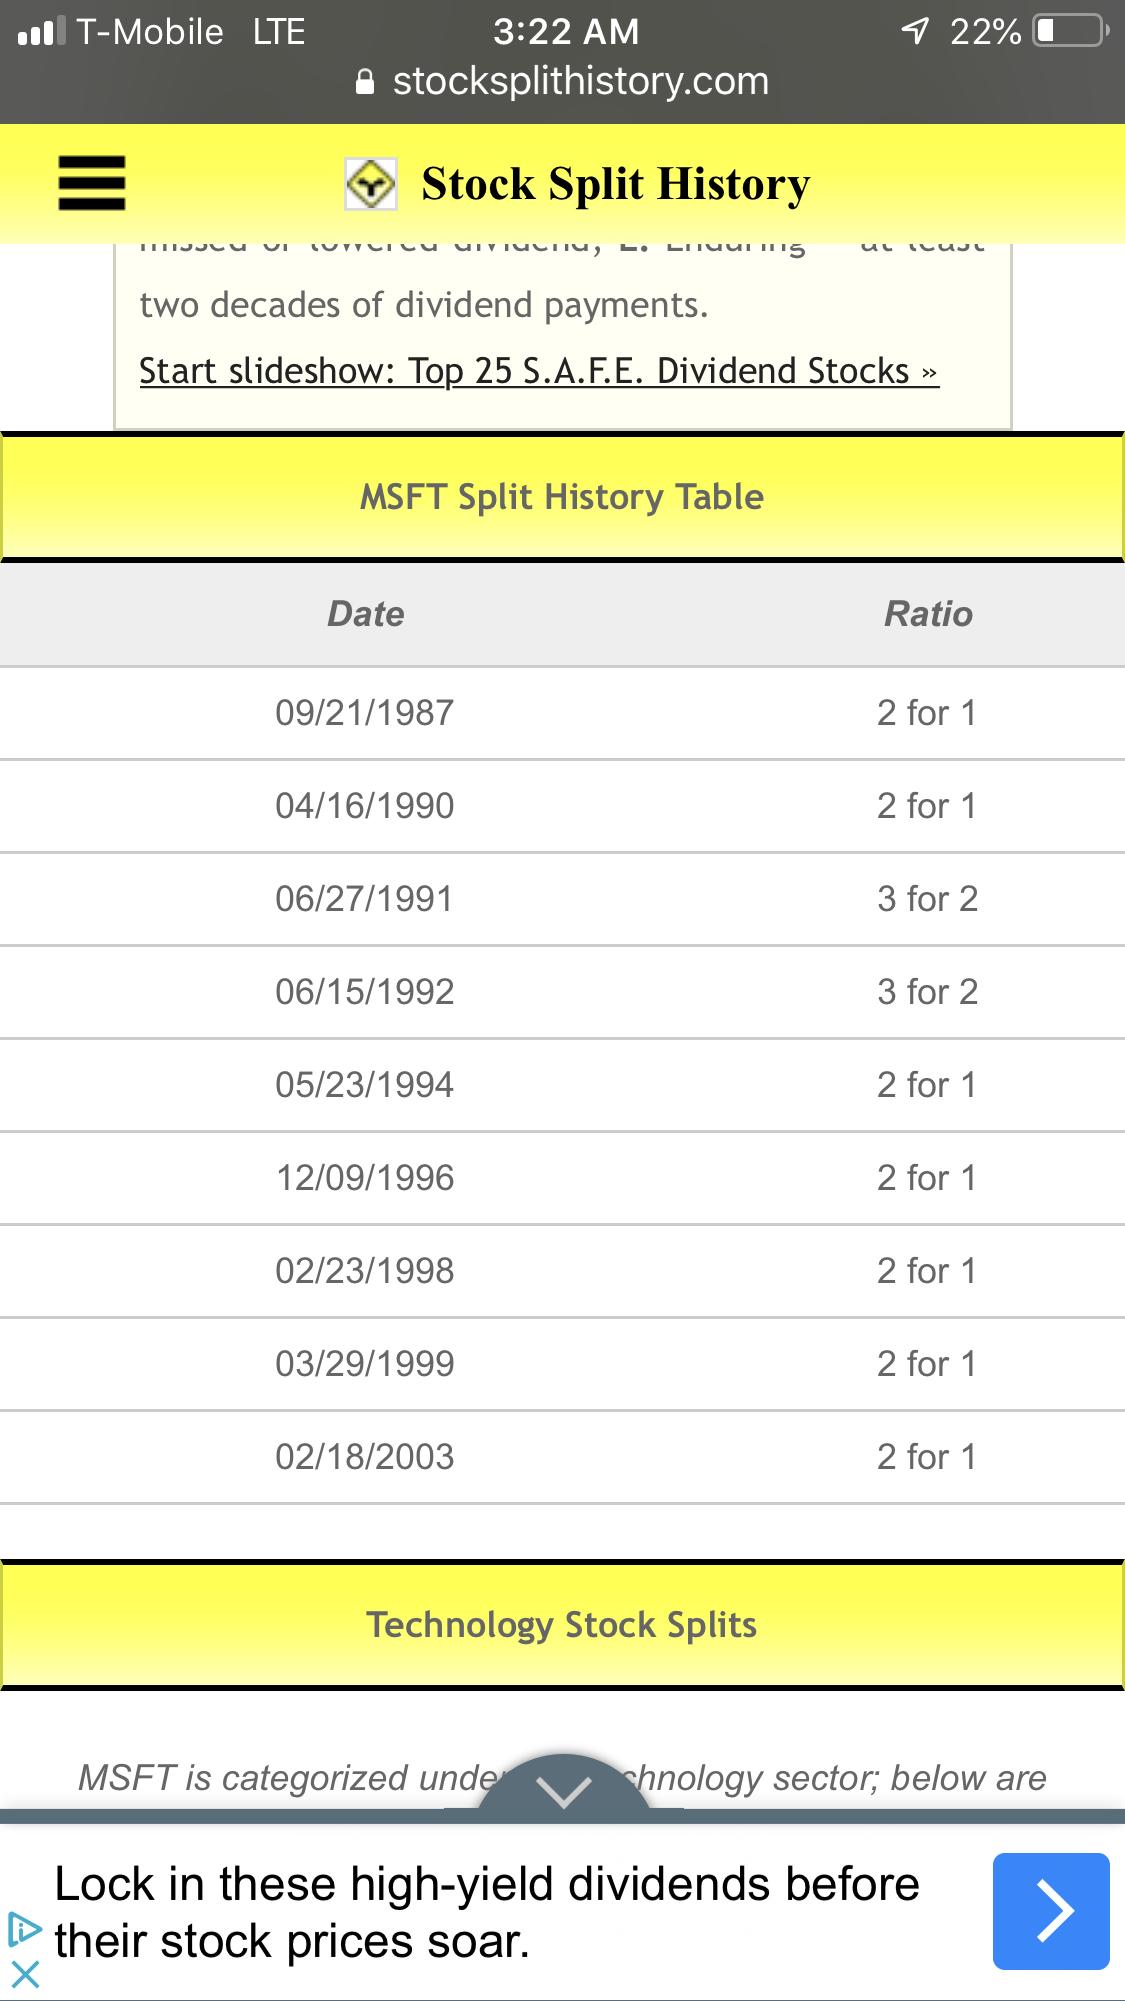 Shopify Stock Split History